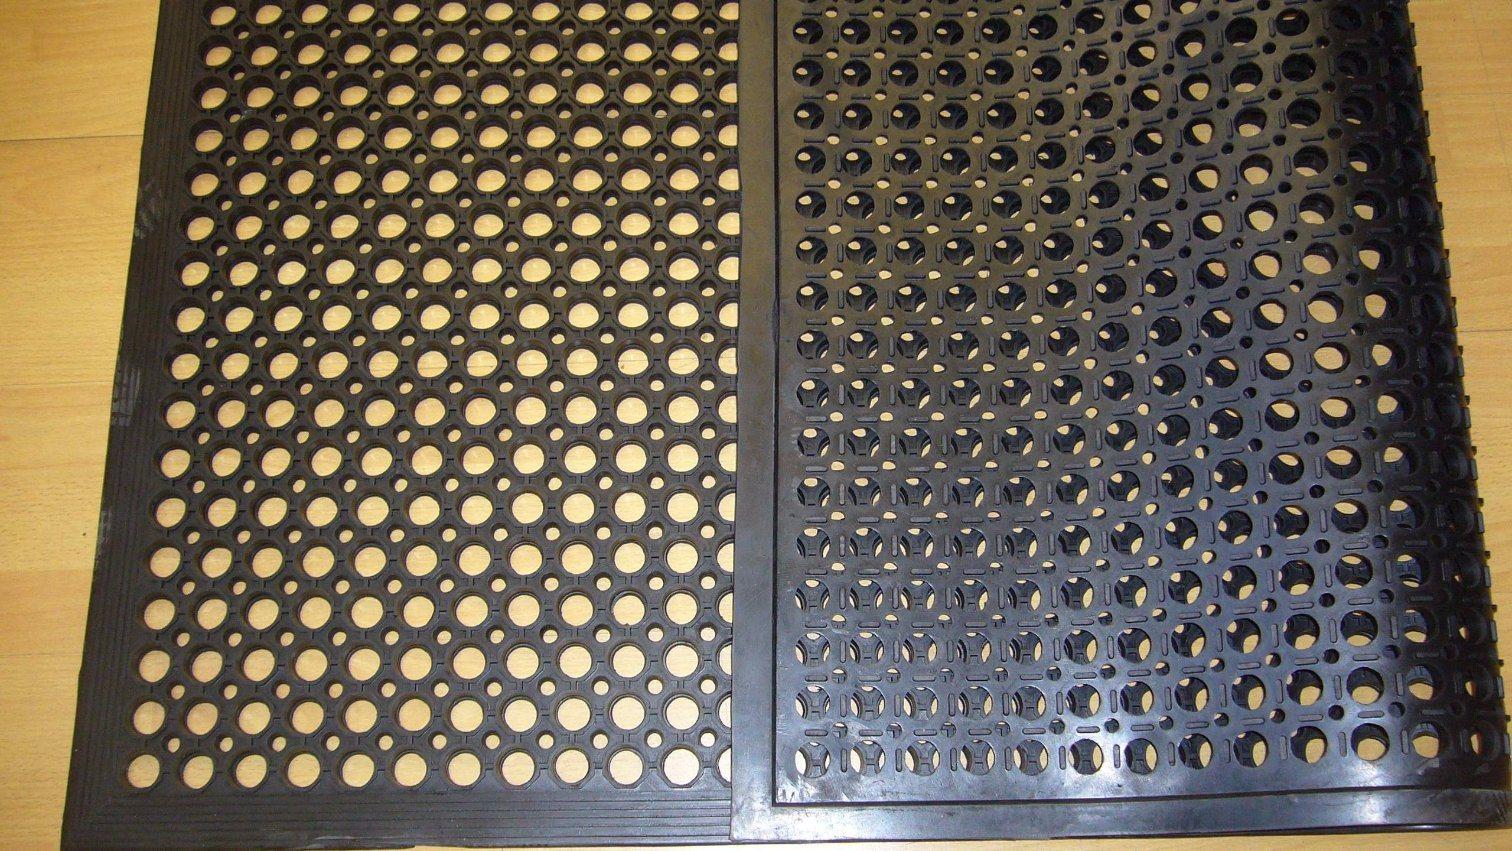 dek cactus dri mat tiles drainage floor x inch mats vinyl blue pbt pool rubber interlocking